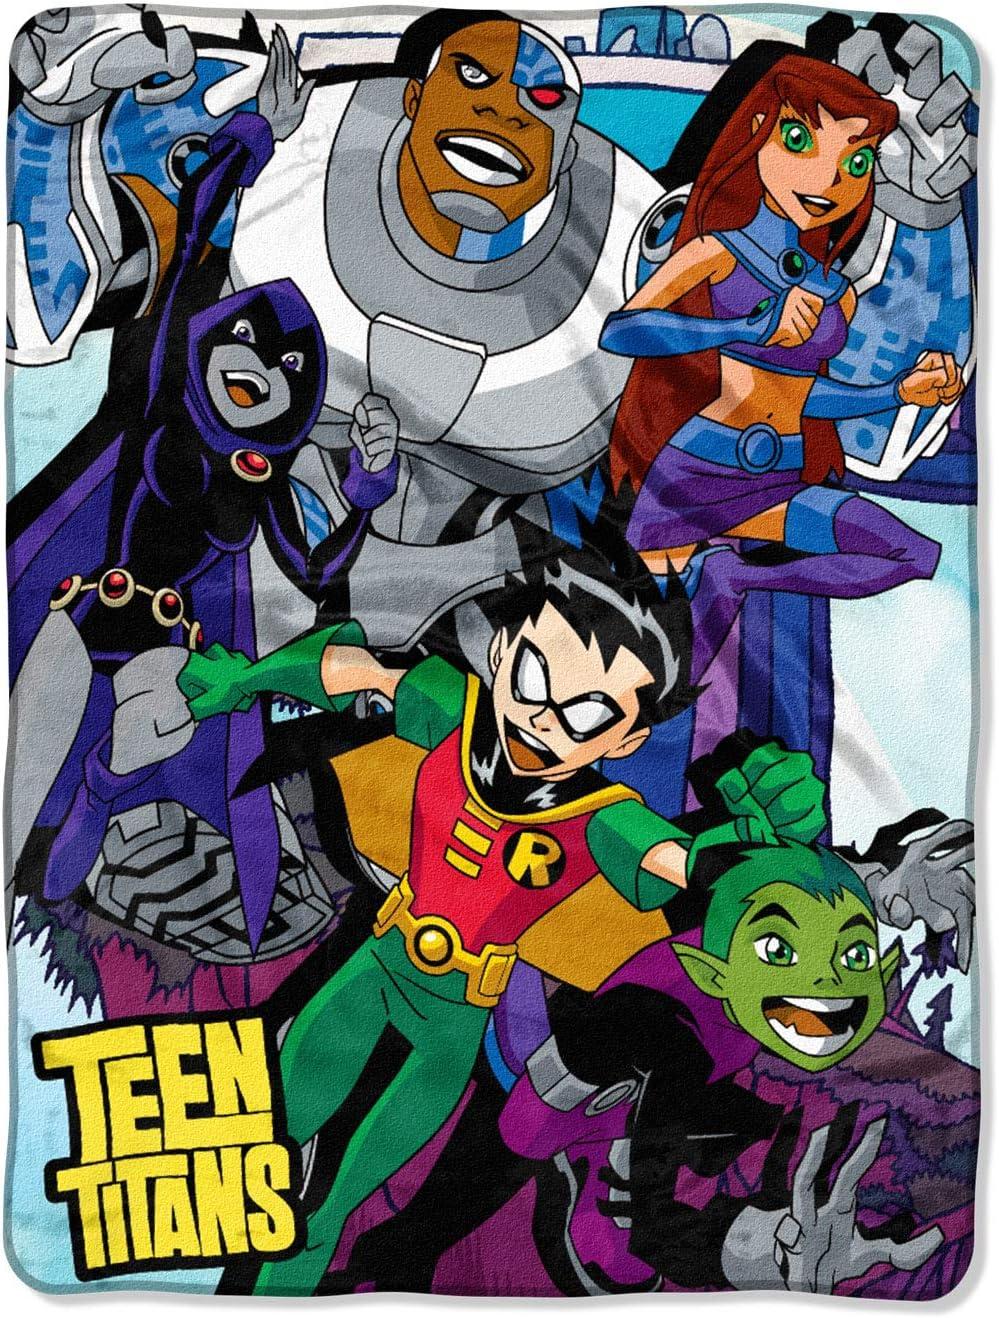 Teen Titans Let S Go Robin Cyborg Beast Boy Starfire Raven Plush Throw Blanket 46 X 60 Amazon Ca Home Kitchen